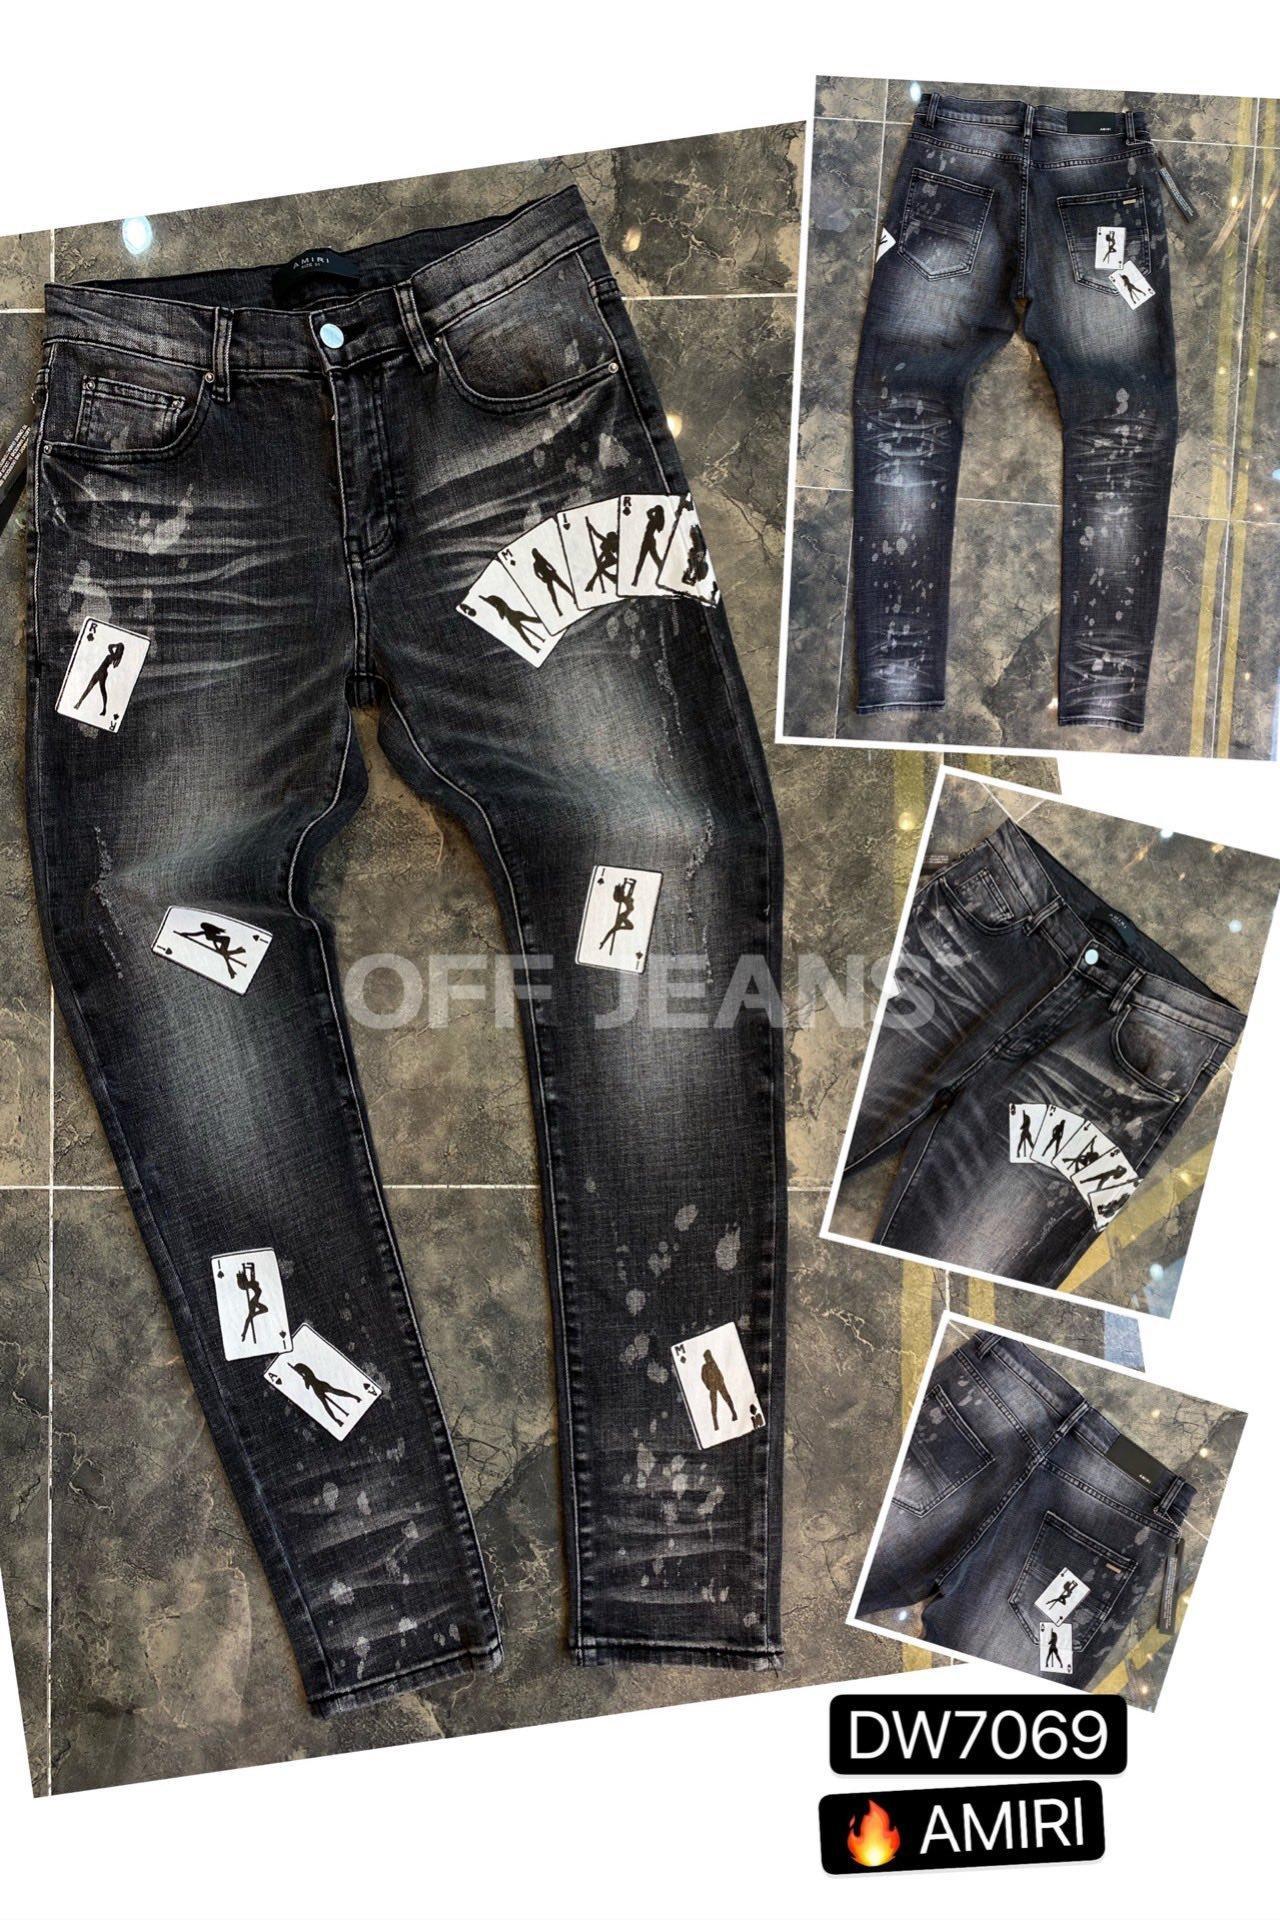 Erkek Jeans Hip Hop Pantolon Stilist Jeans Sıkıntılı Biker Jean Slim Fit Motosiklet Denim Jeans Boyutu 28-40 ~~ FS34 Ripped ##